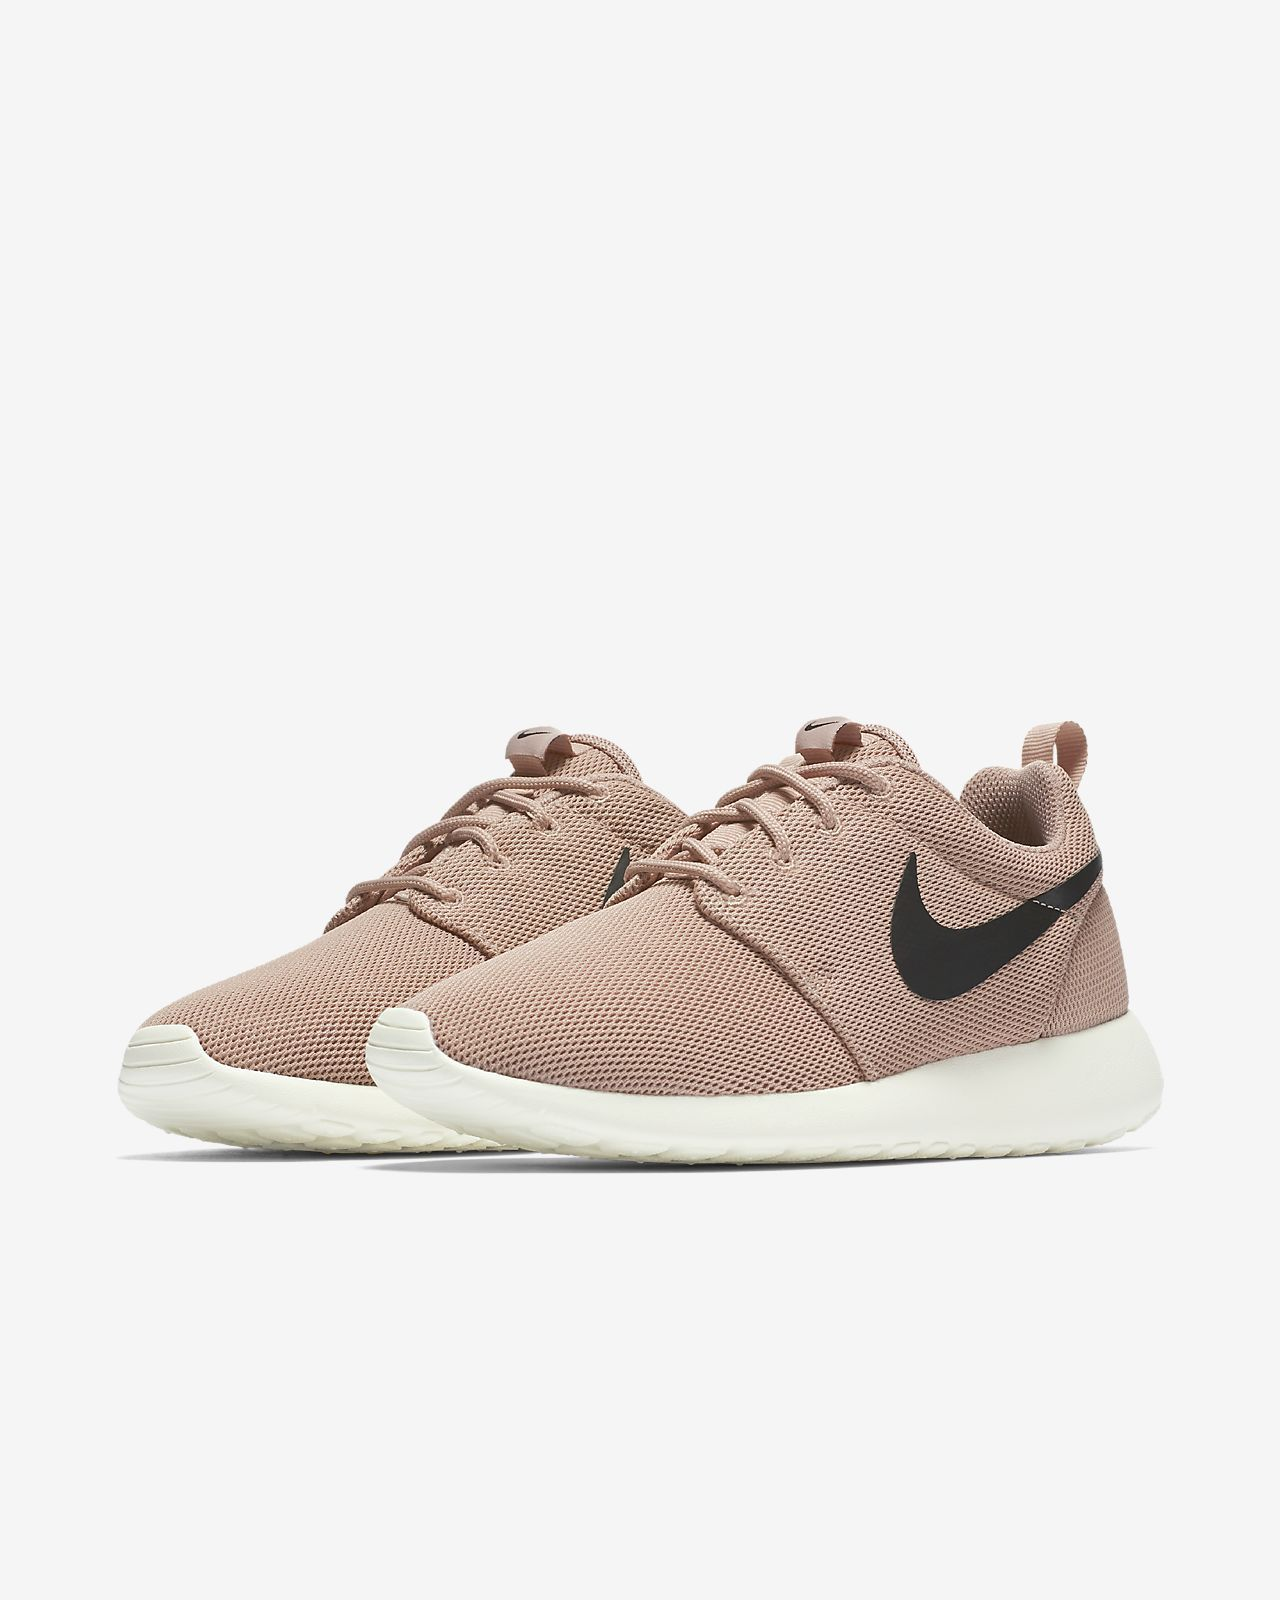 f579d7f7861b Nike Roshe One Women s Shoe